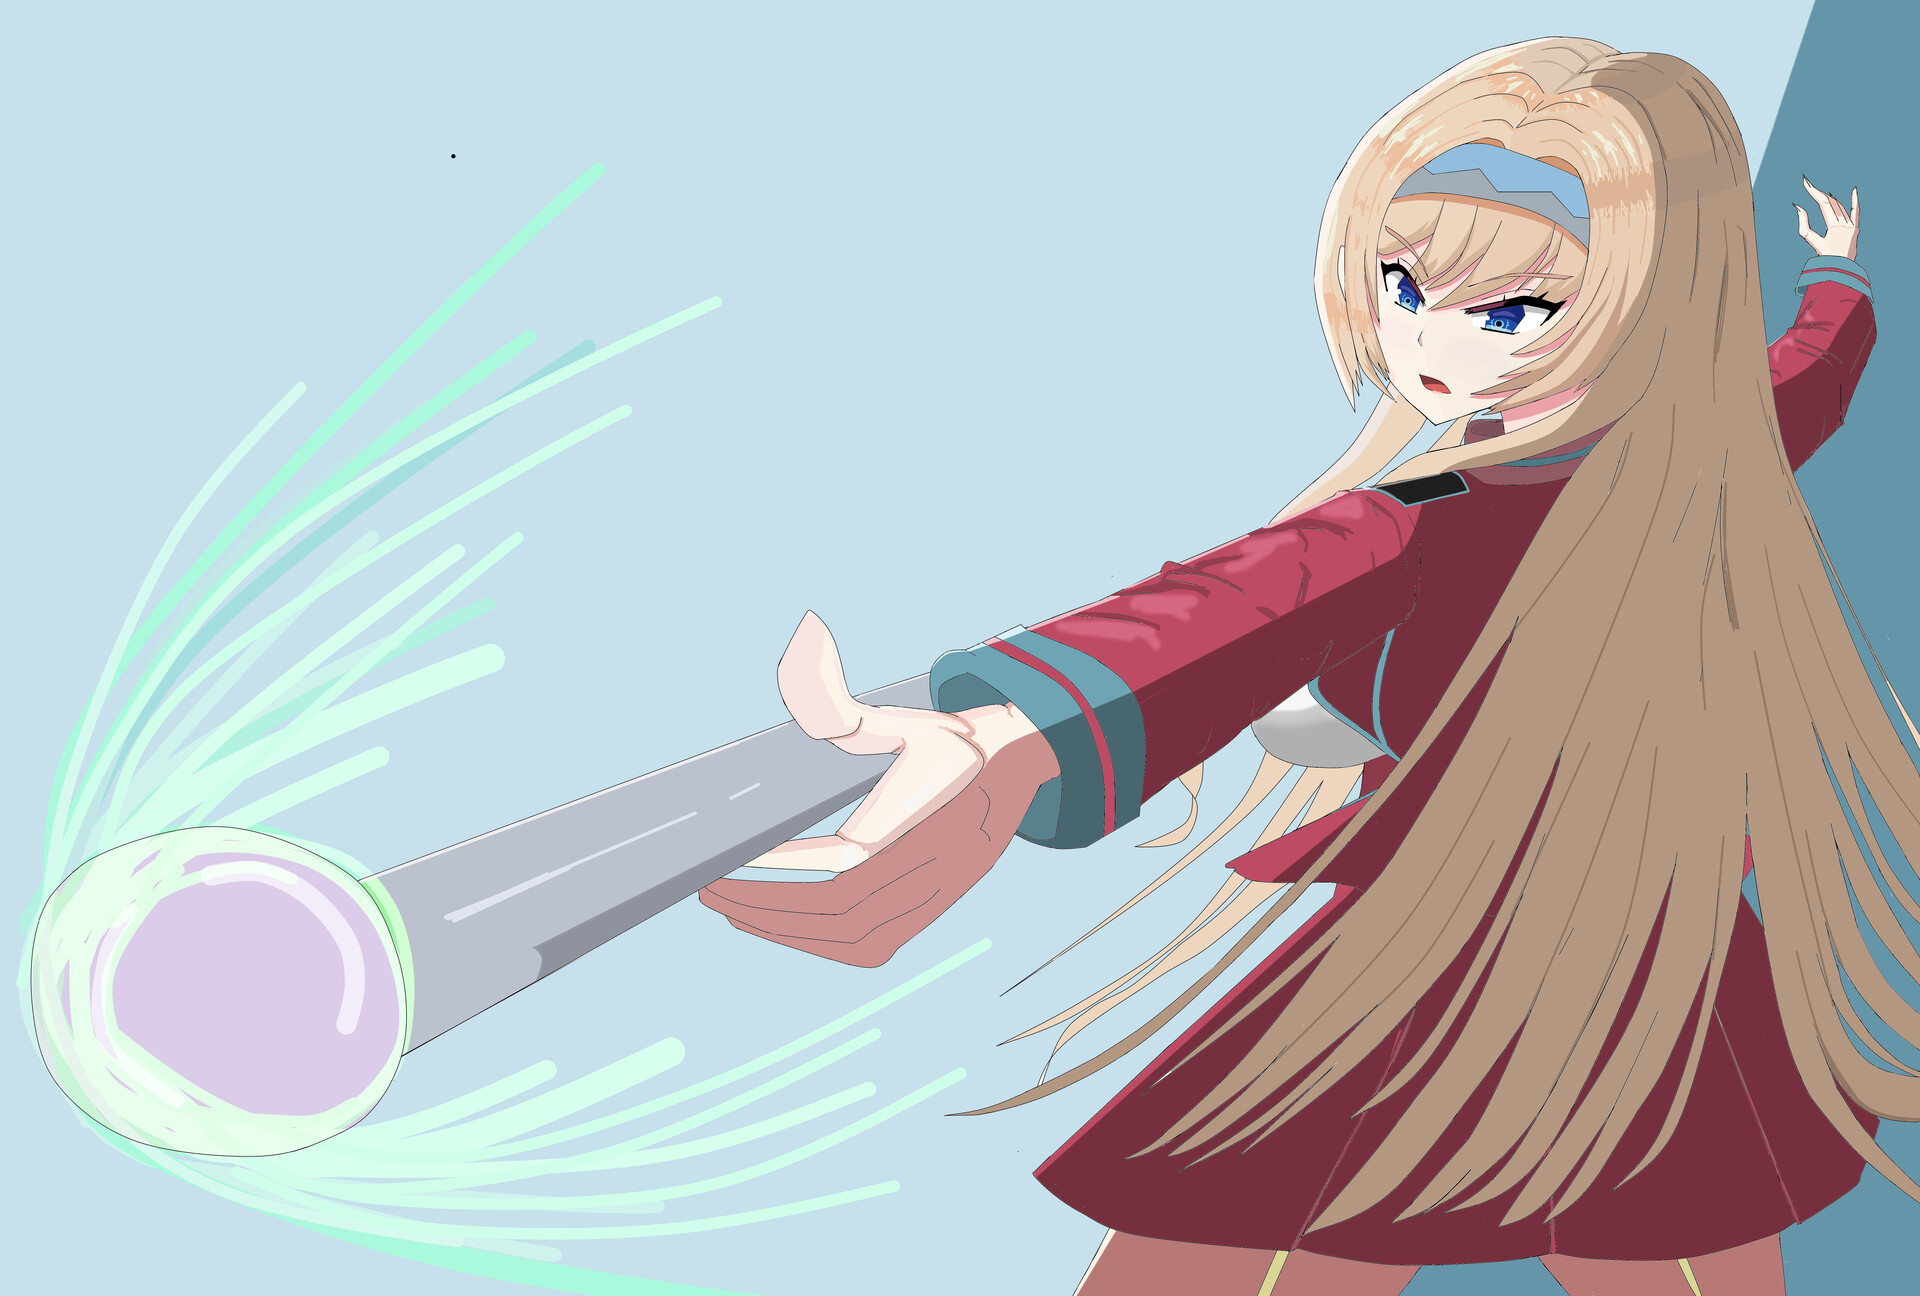 nenorblack-mary-vs-protagonist.jpg?16190